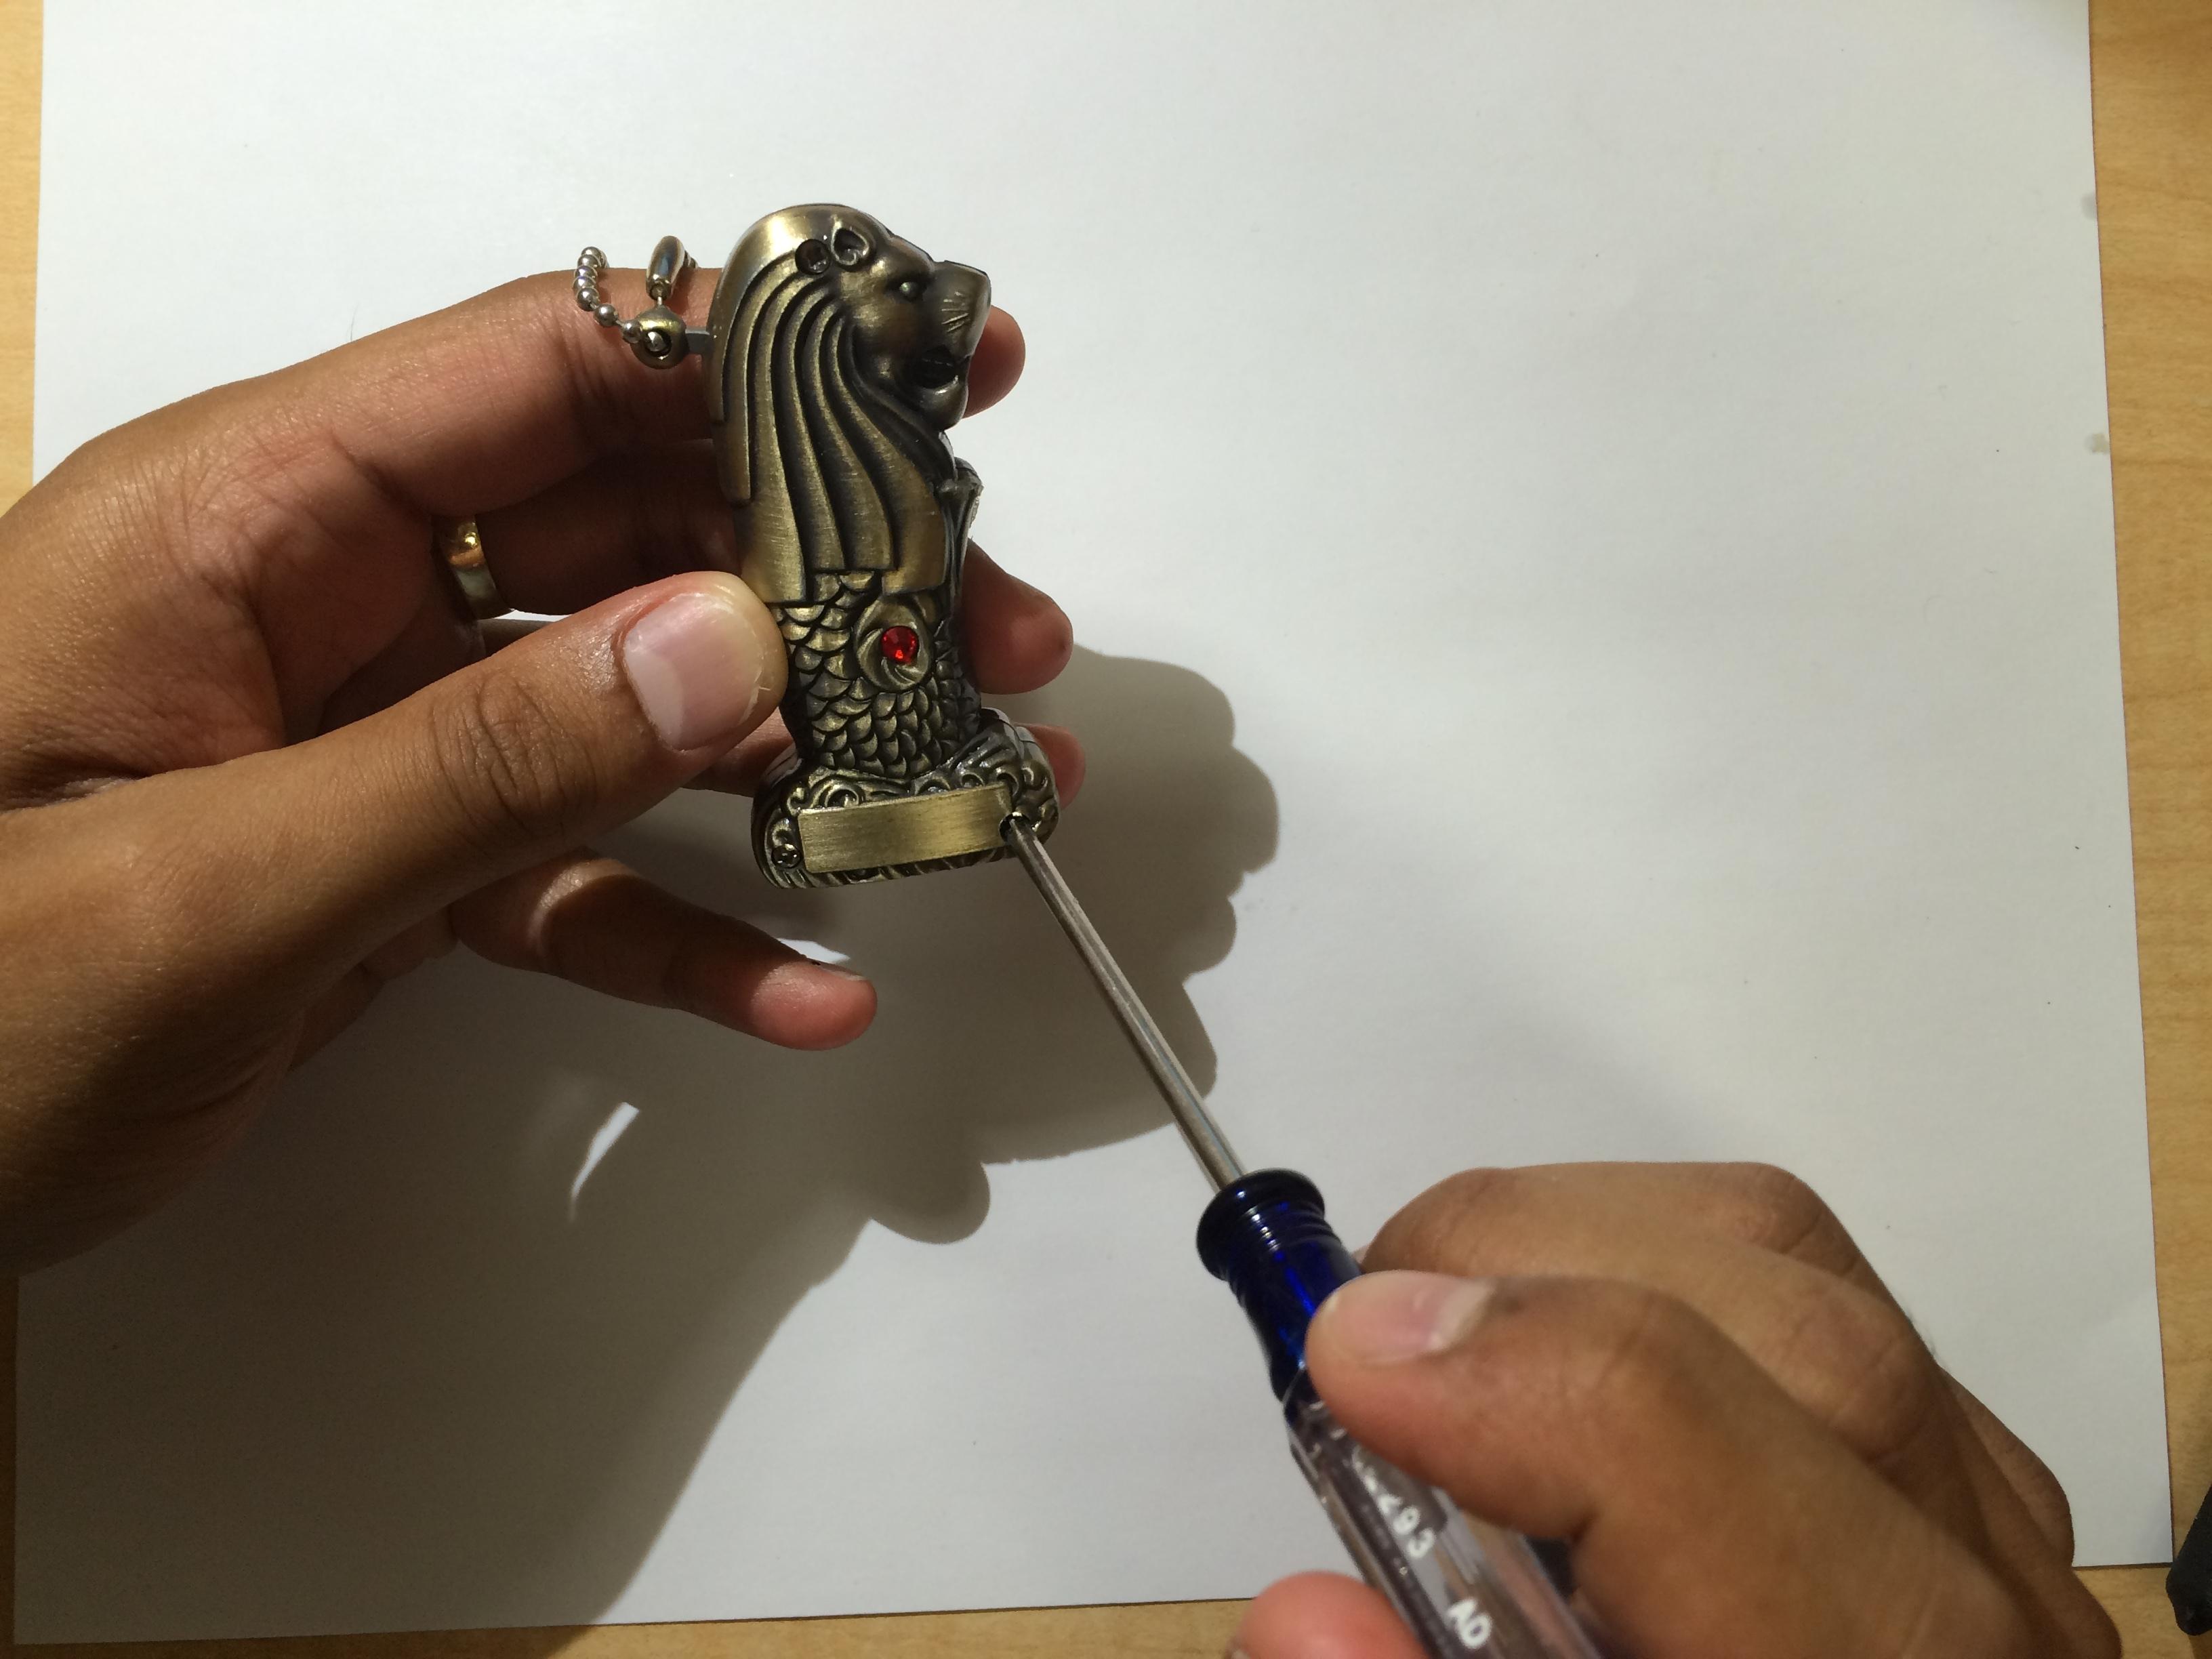 Lighter - iFixit